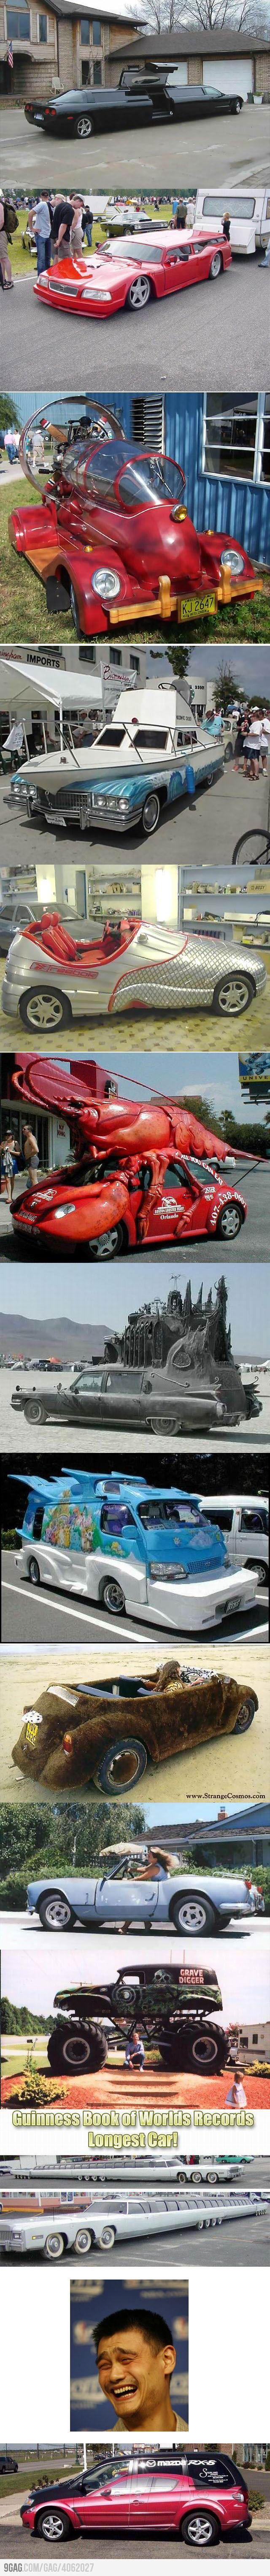 Veículos Bizarros by Daniel Alho / weird cars